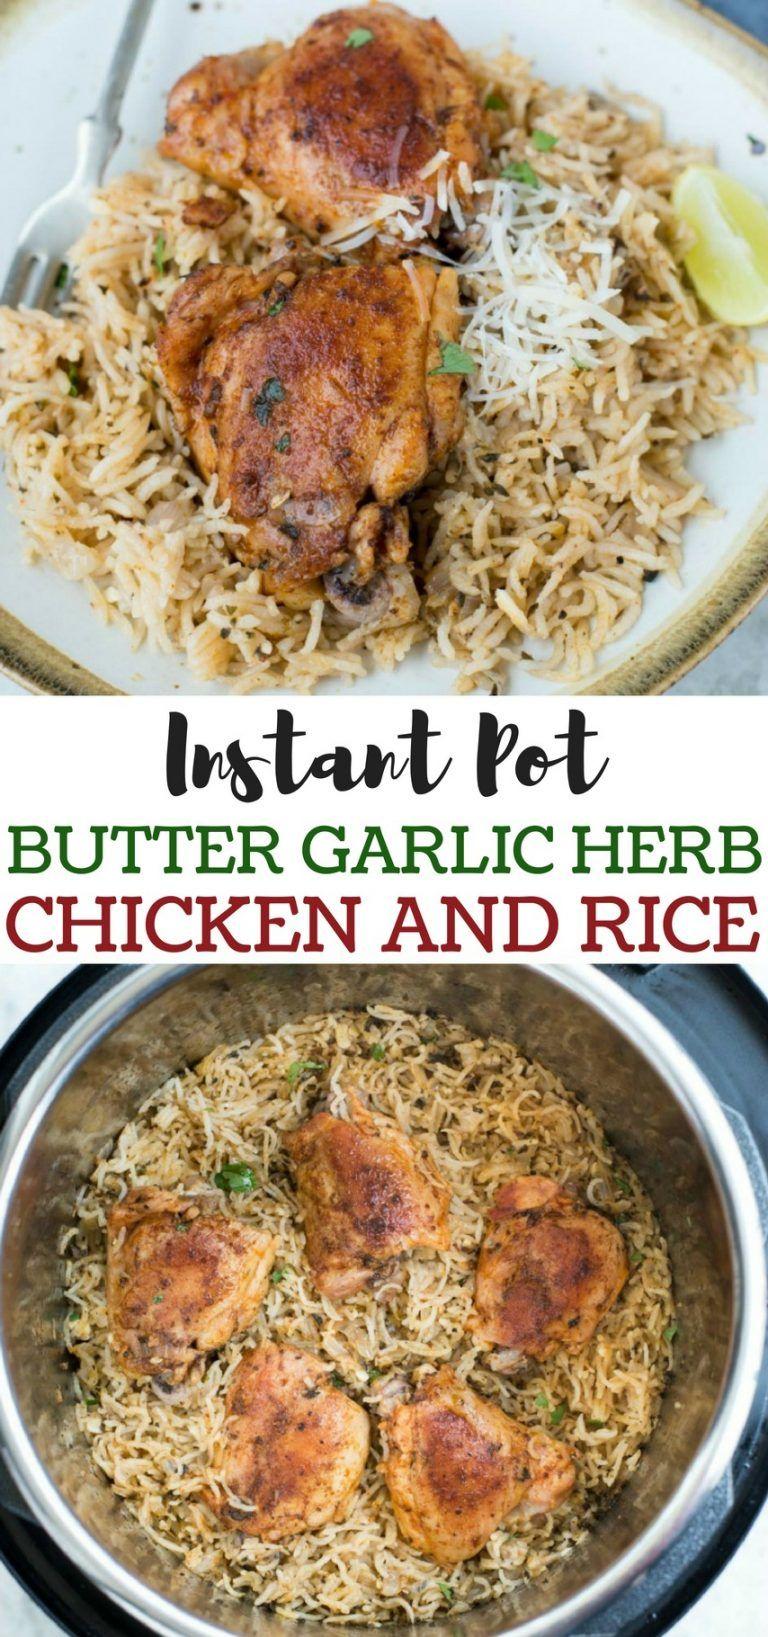 INSTANT POT GARLIC HERB CHICKEN AND RICE #instantpotrecipes